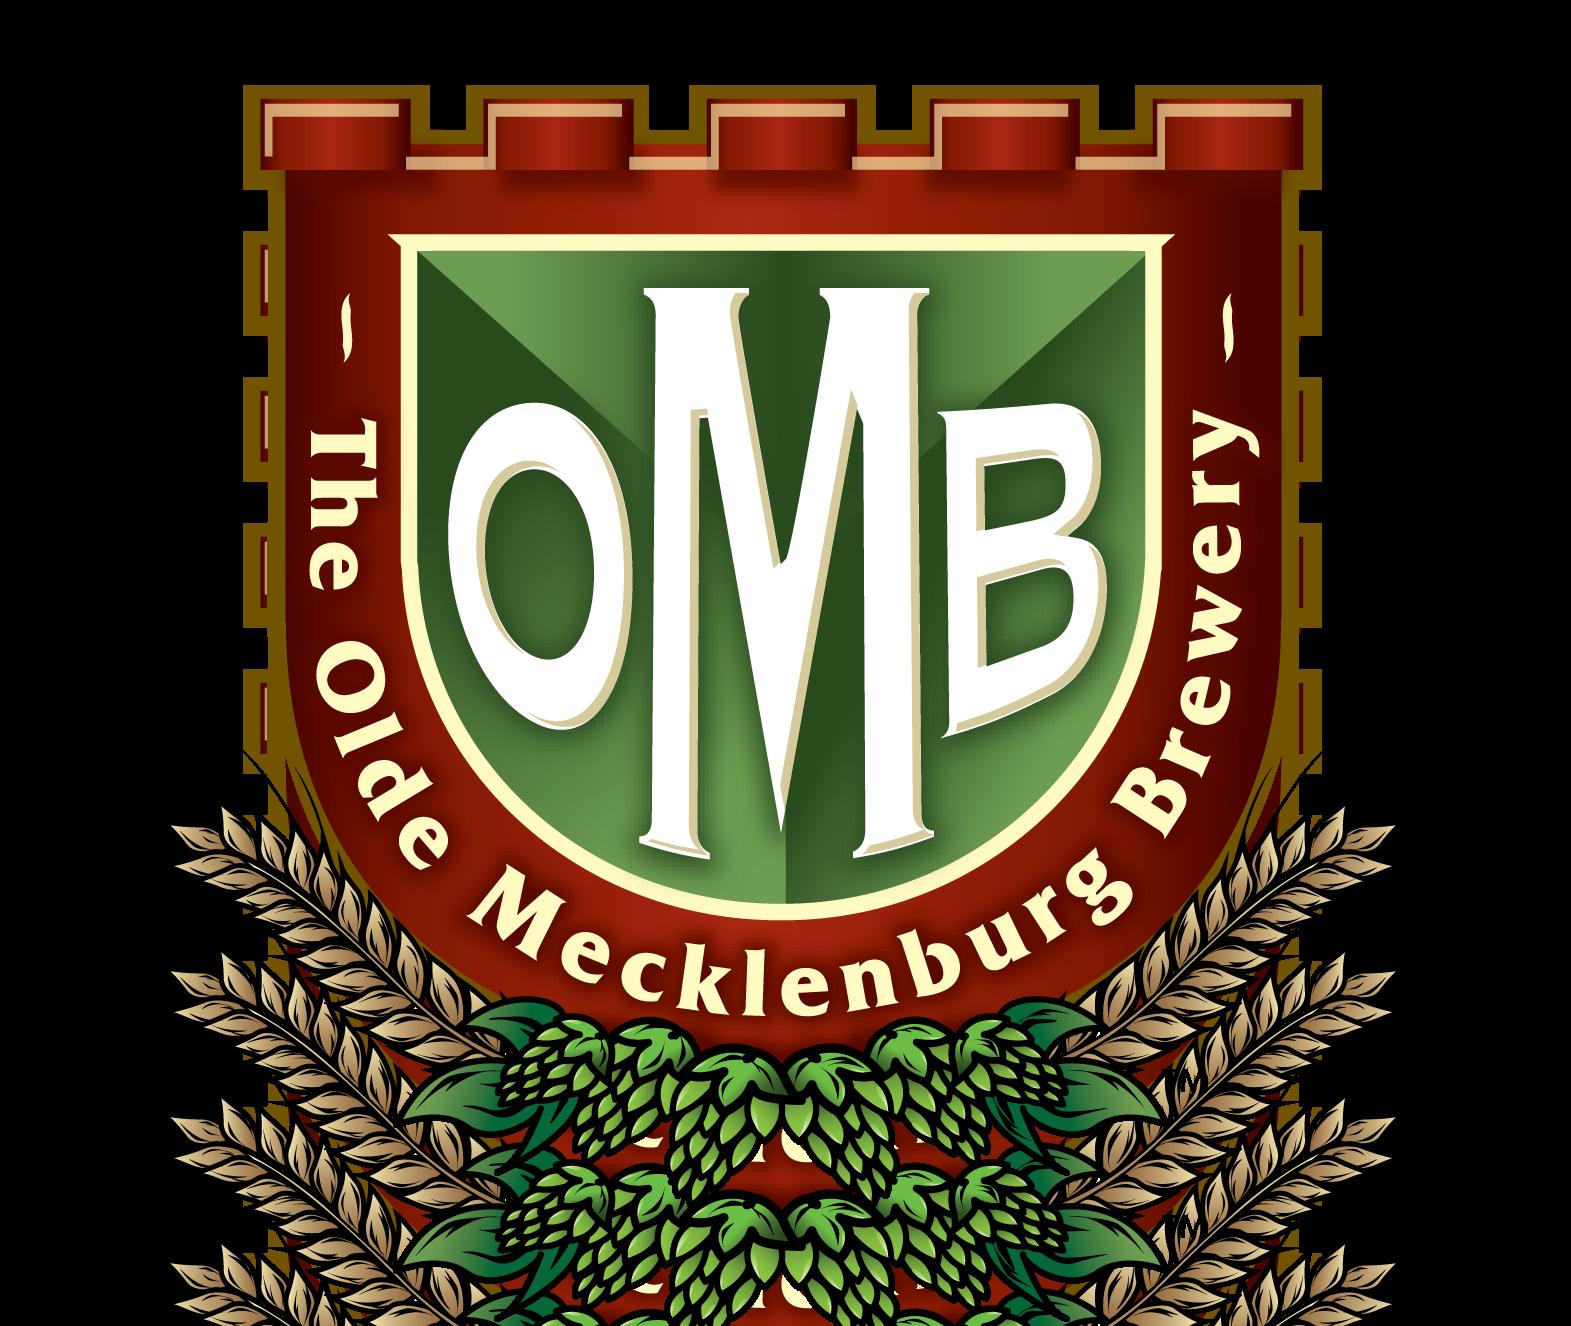 The Olde Mecklenburg Brewery logo